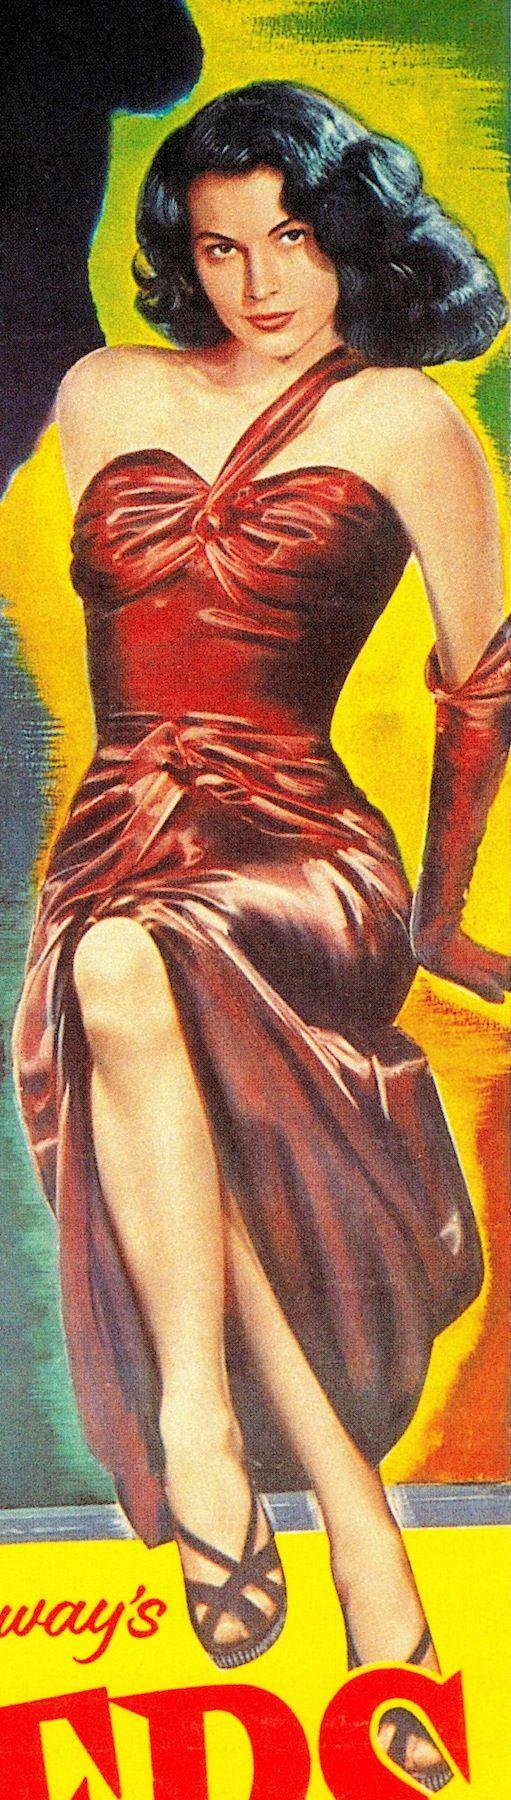 AVA GARDNER as Kitty Collins in THE KILLERS (1946) & Burt Lancaster. Original POSTER (detail) dir: Robert Siodmak. prod: Mark Hellinger. Gown supervisor VERA WEST. 'Hit men kill an unresisting victim, and investigator Reardon uncovers his past involvement with beautiful, deadly Kitty Collins' imdb. From The Art of Noir by Eddie Muller (2002) (please follow minkshmink on pinterest) #filmnoir #thekillers #avagardner #burtlancaster #lighting #femmefatale #seductress #badgirl